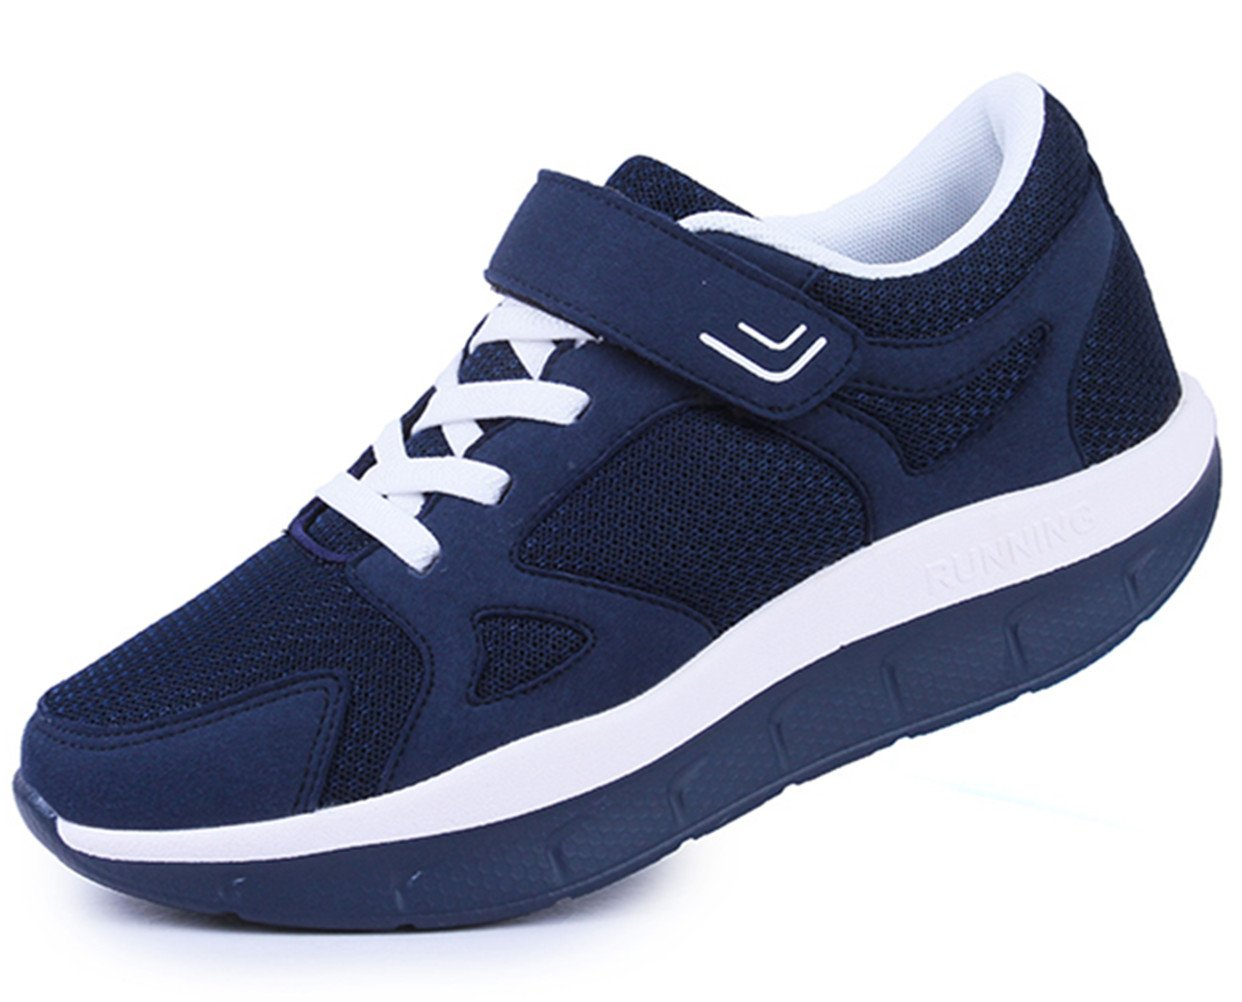 DADAWEN Women's Platform Wedges Tennis Walking Sneakers Comfortable Lightweight Casual Fitness Shoes Dark Blue US Size 9.5